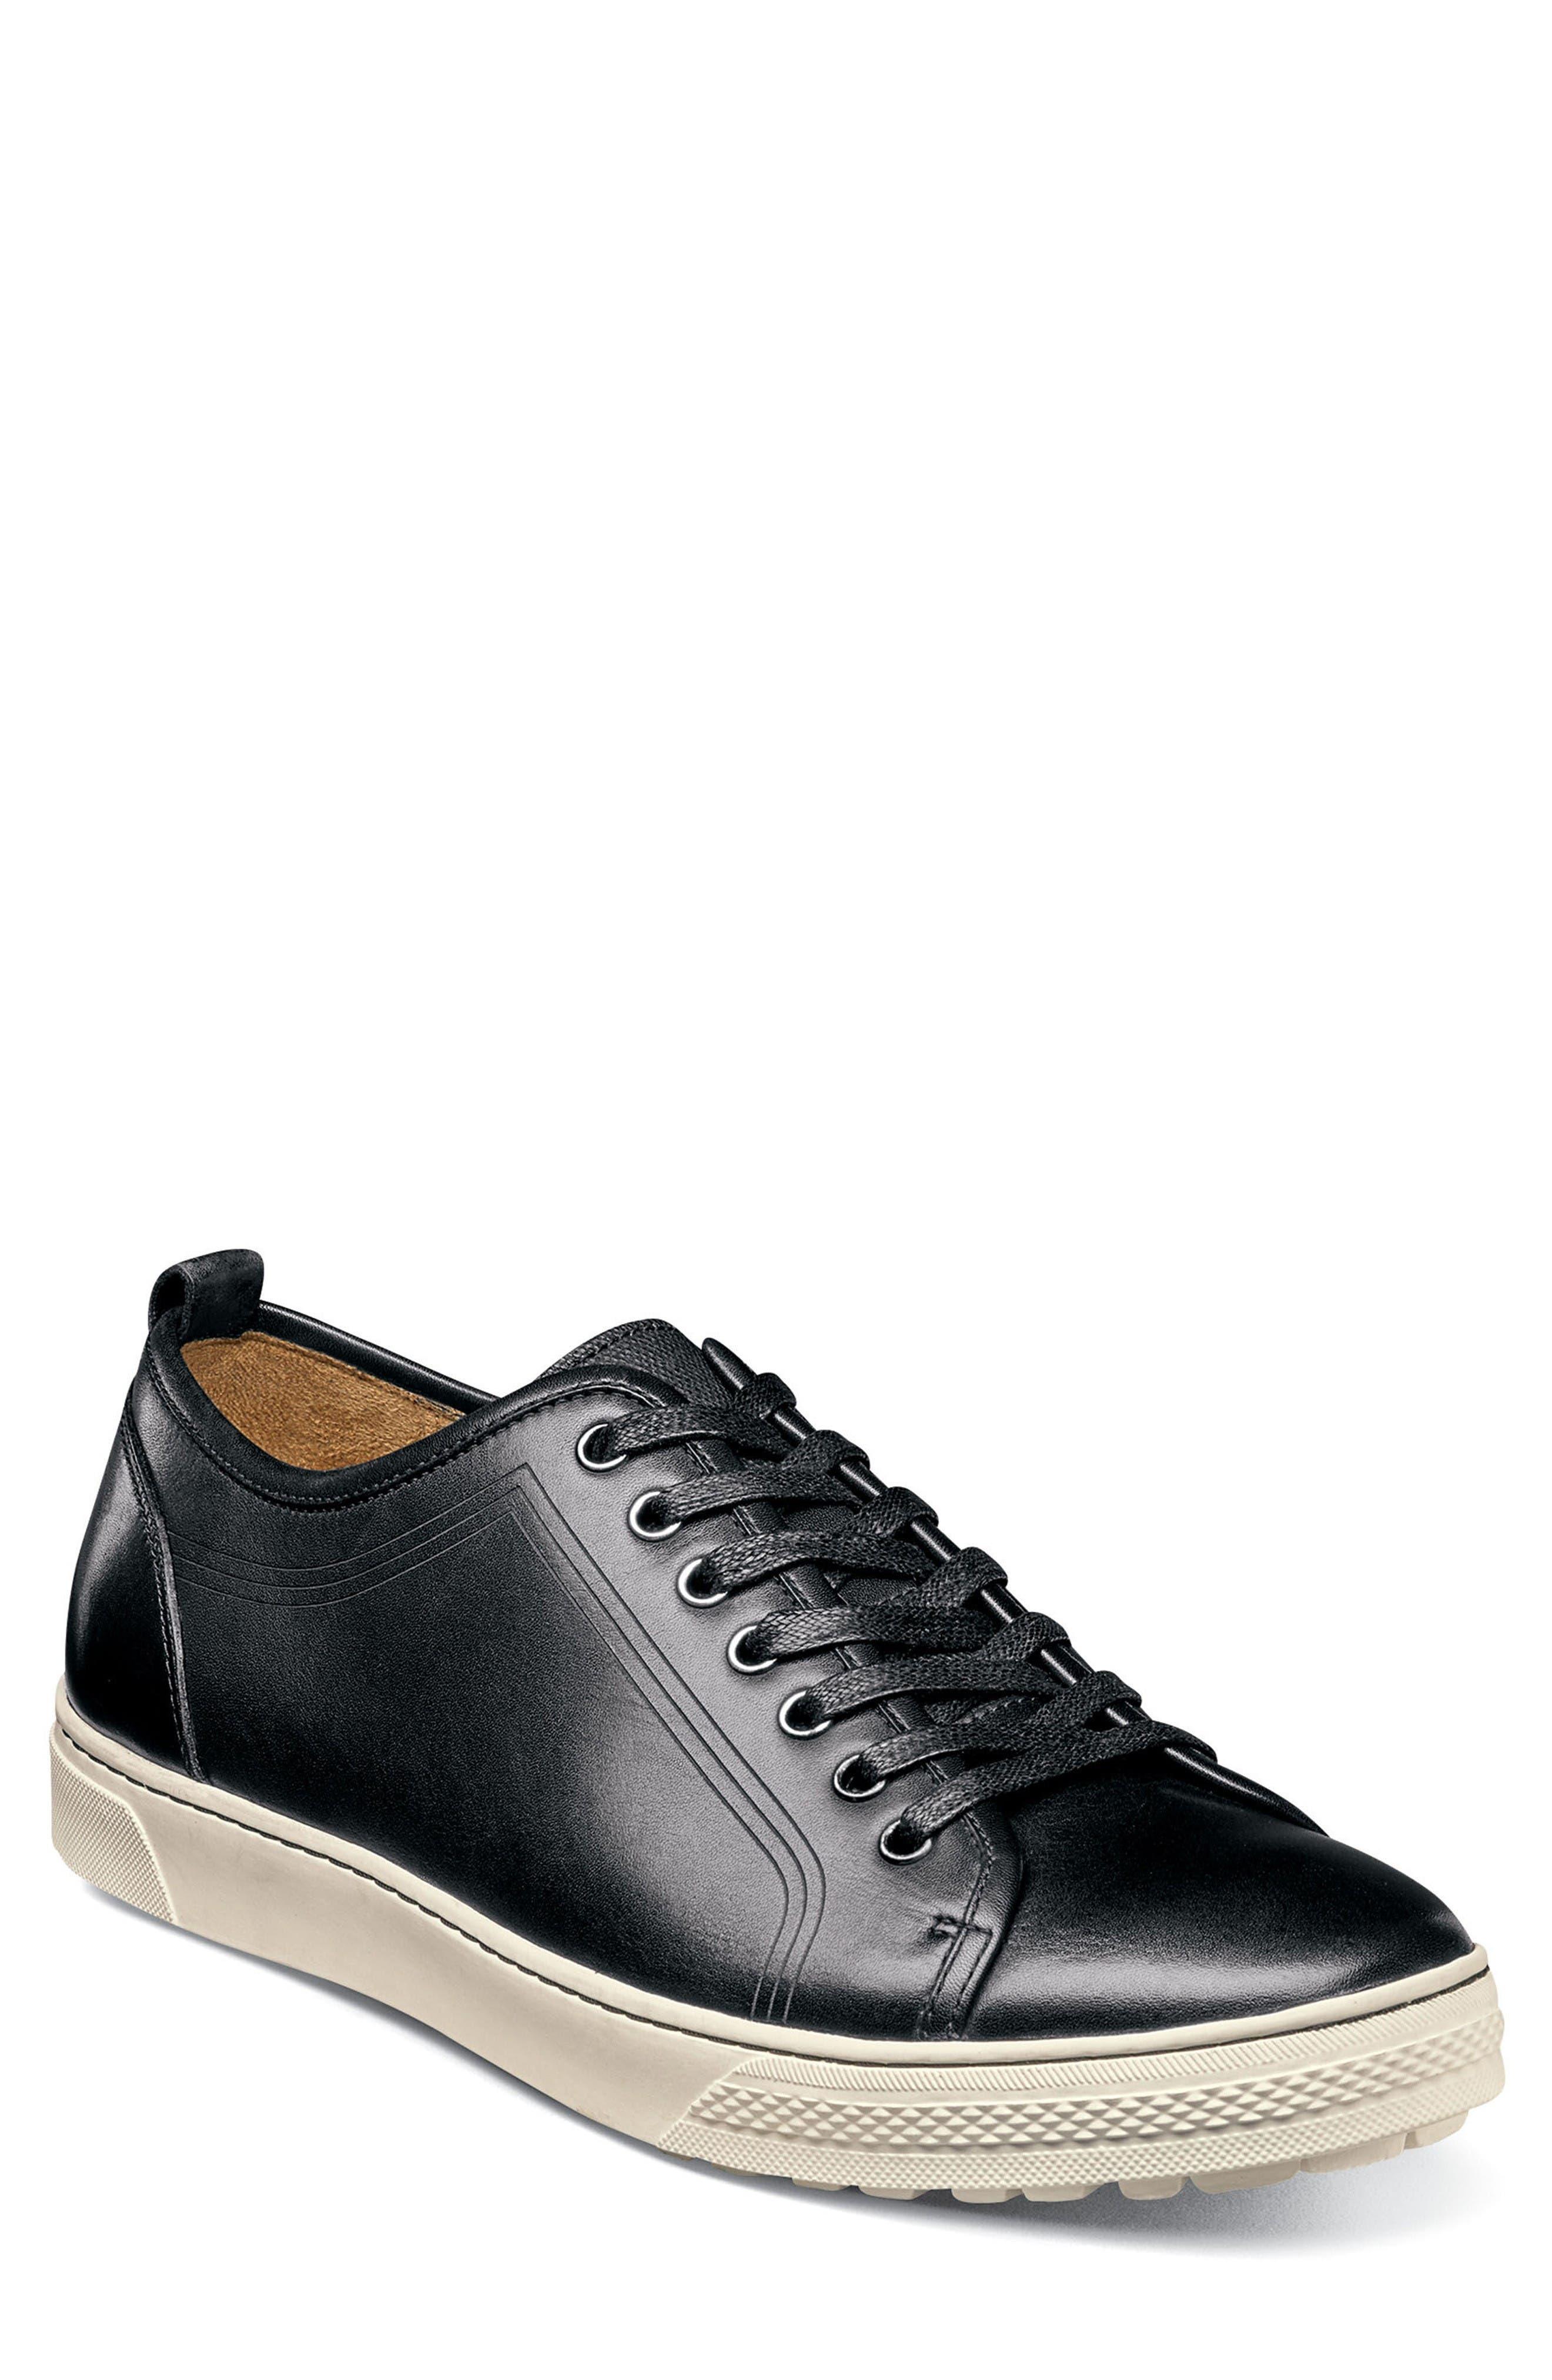 Forward Lo Sneaker,                             Main thumbnail 1, color,                             Black/ White Leather